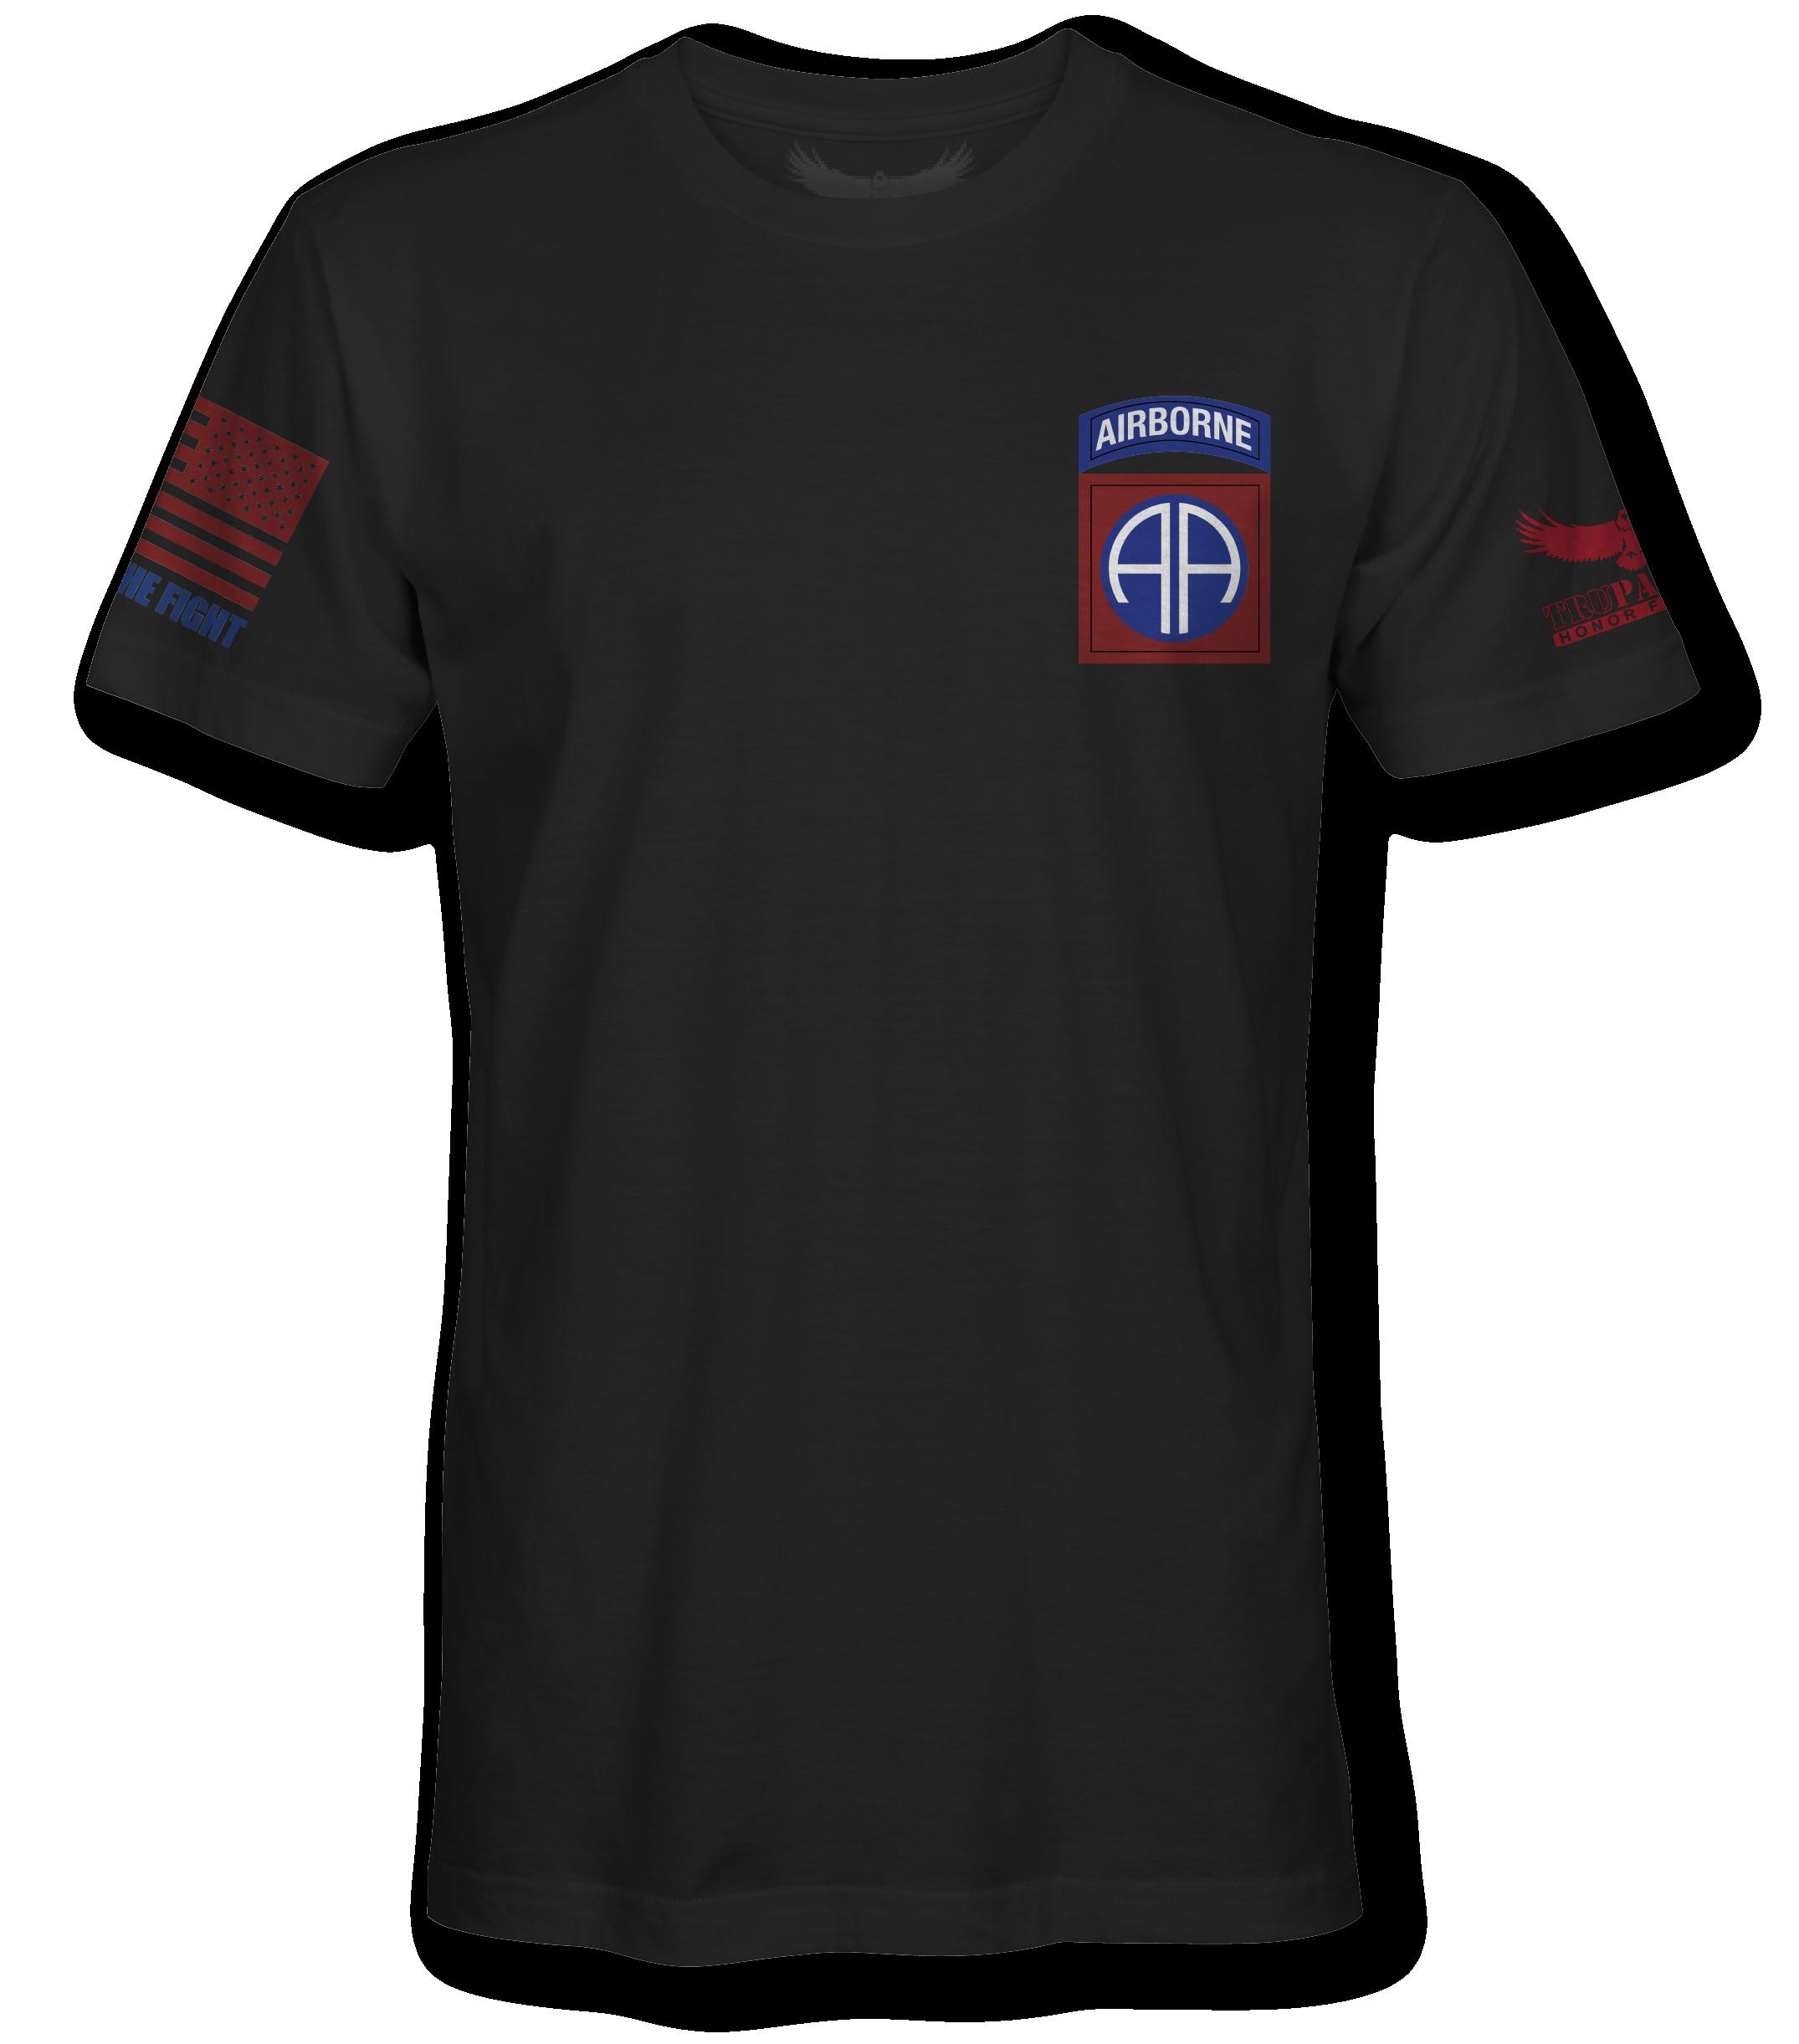 82nd Airborne - Men's TP10031900110000